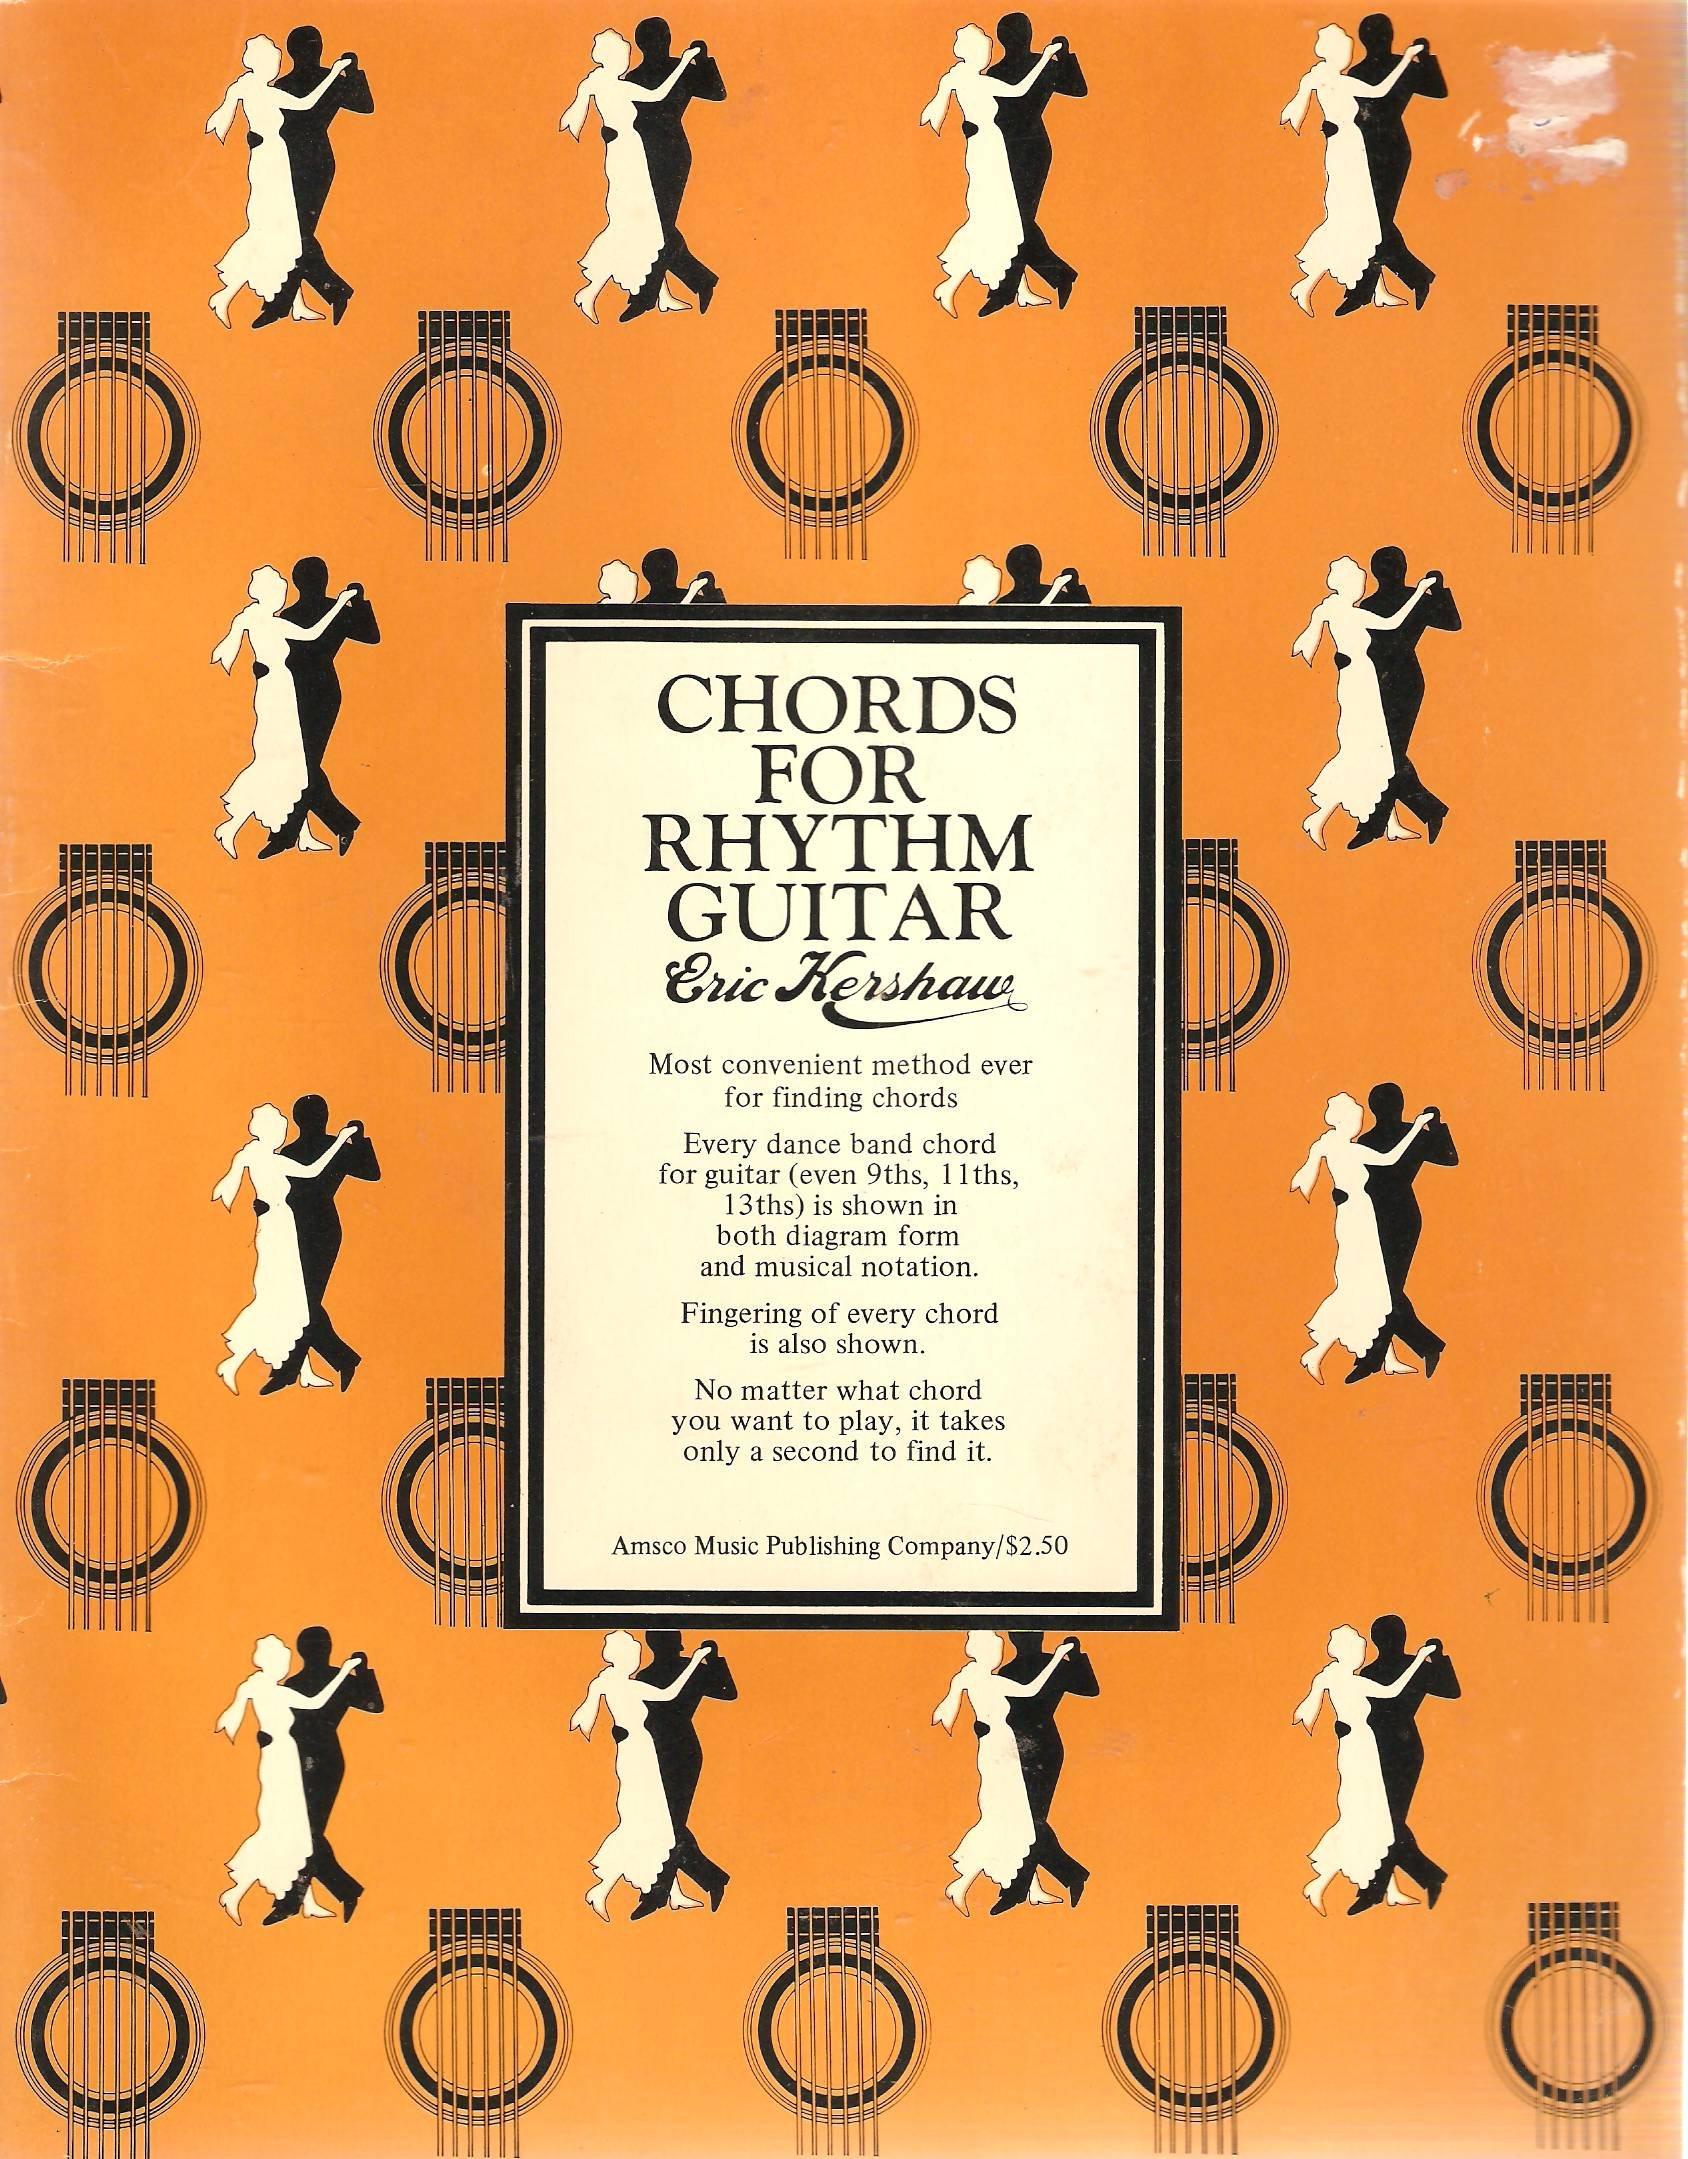 Chords For Rhythm Guitar Eric Kershaw 9780825626807 Amazon Books